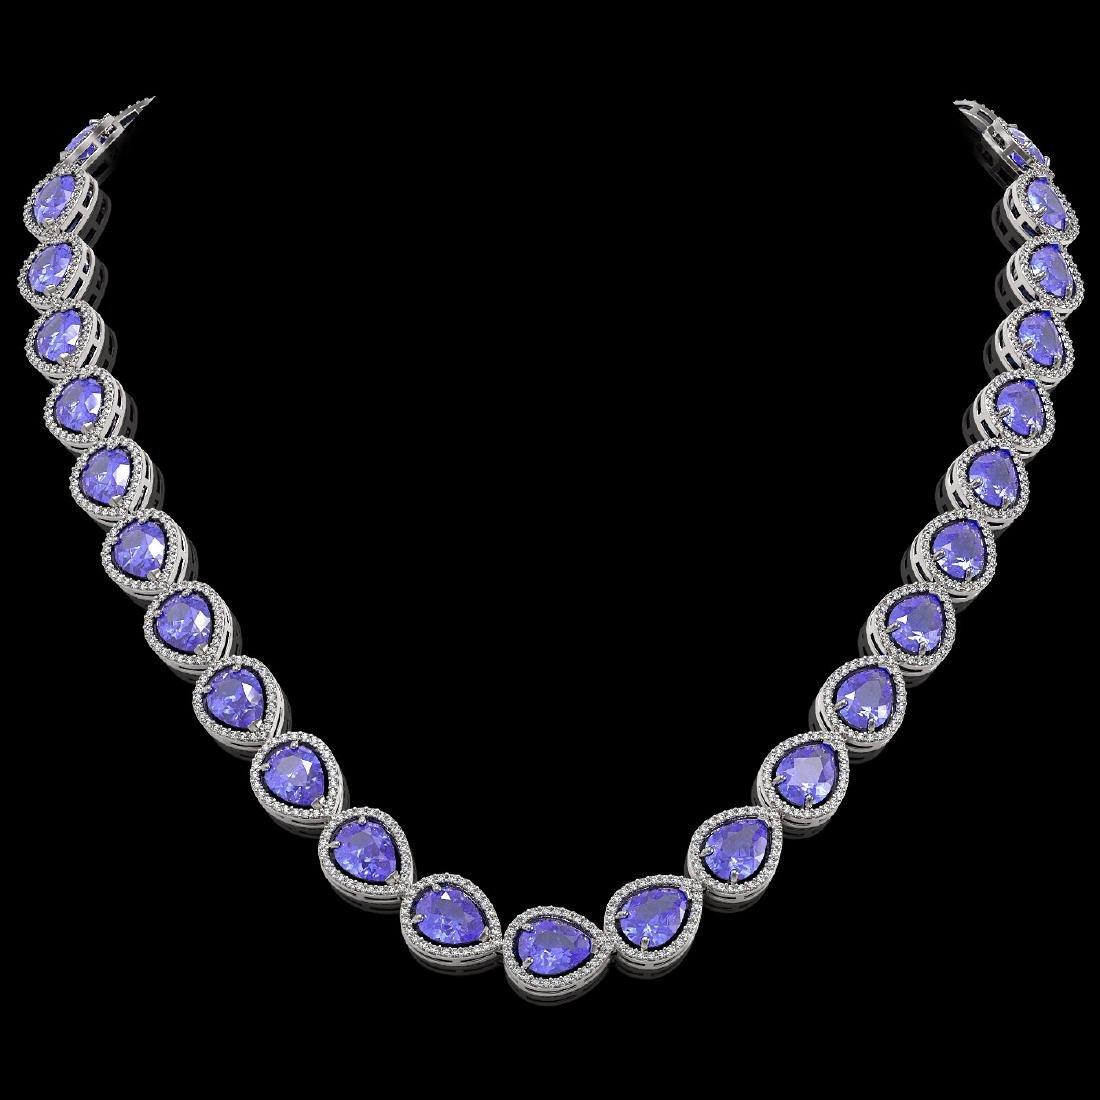 44.8 CTW Tanzanite & Diamond Halo Necklace 10K White